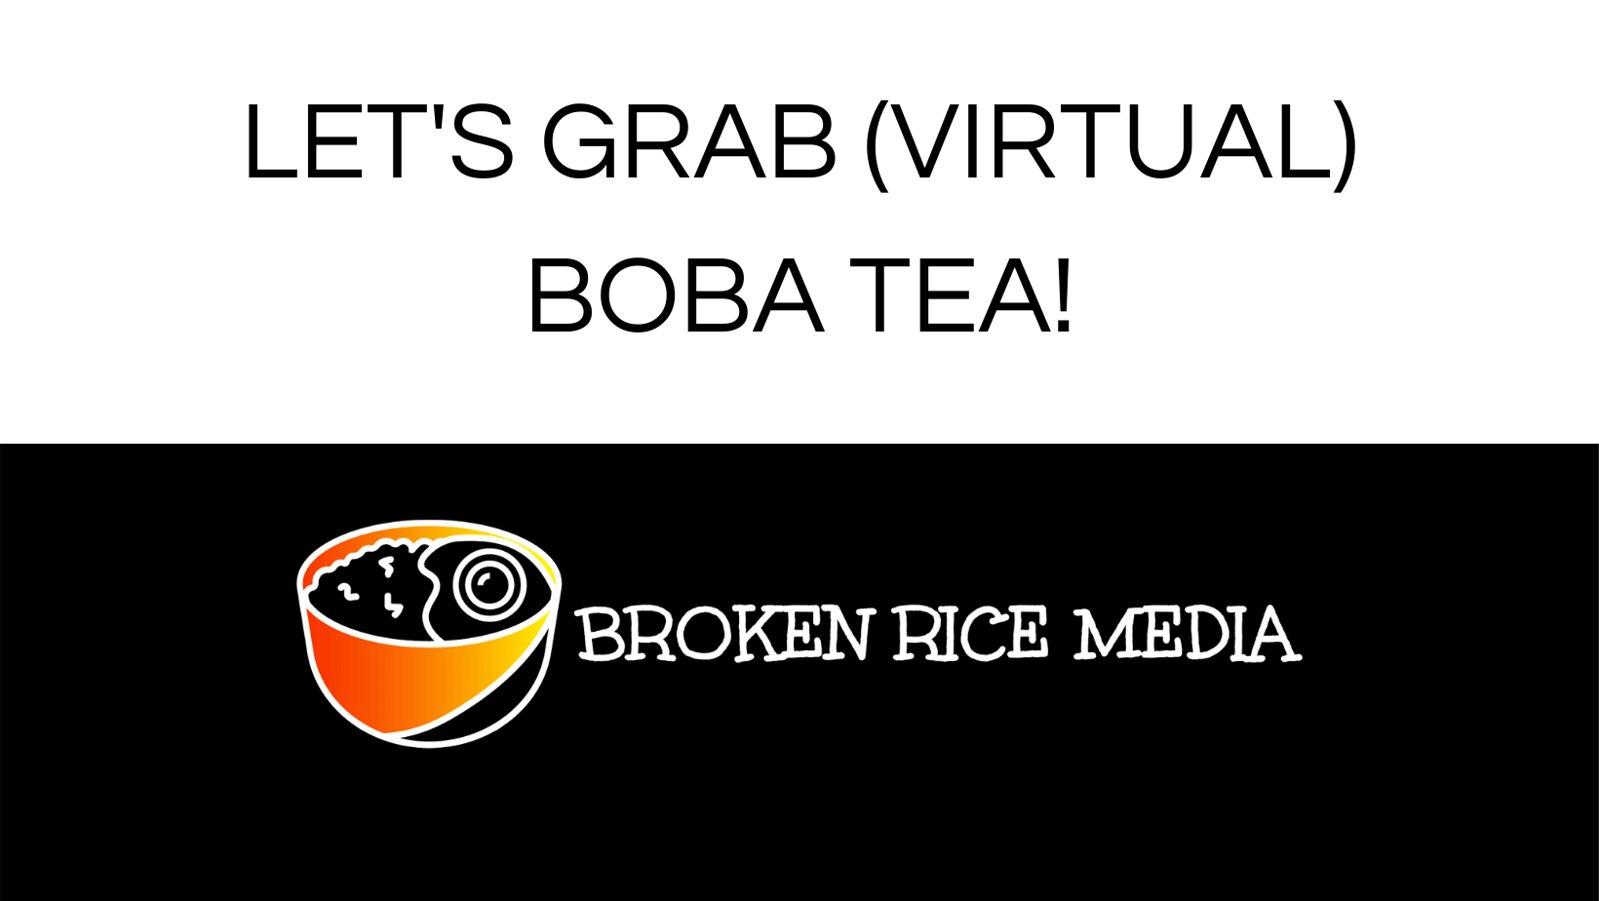 Broken Rice Media LLC Contact